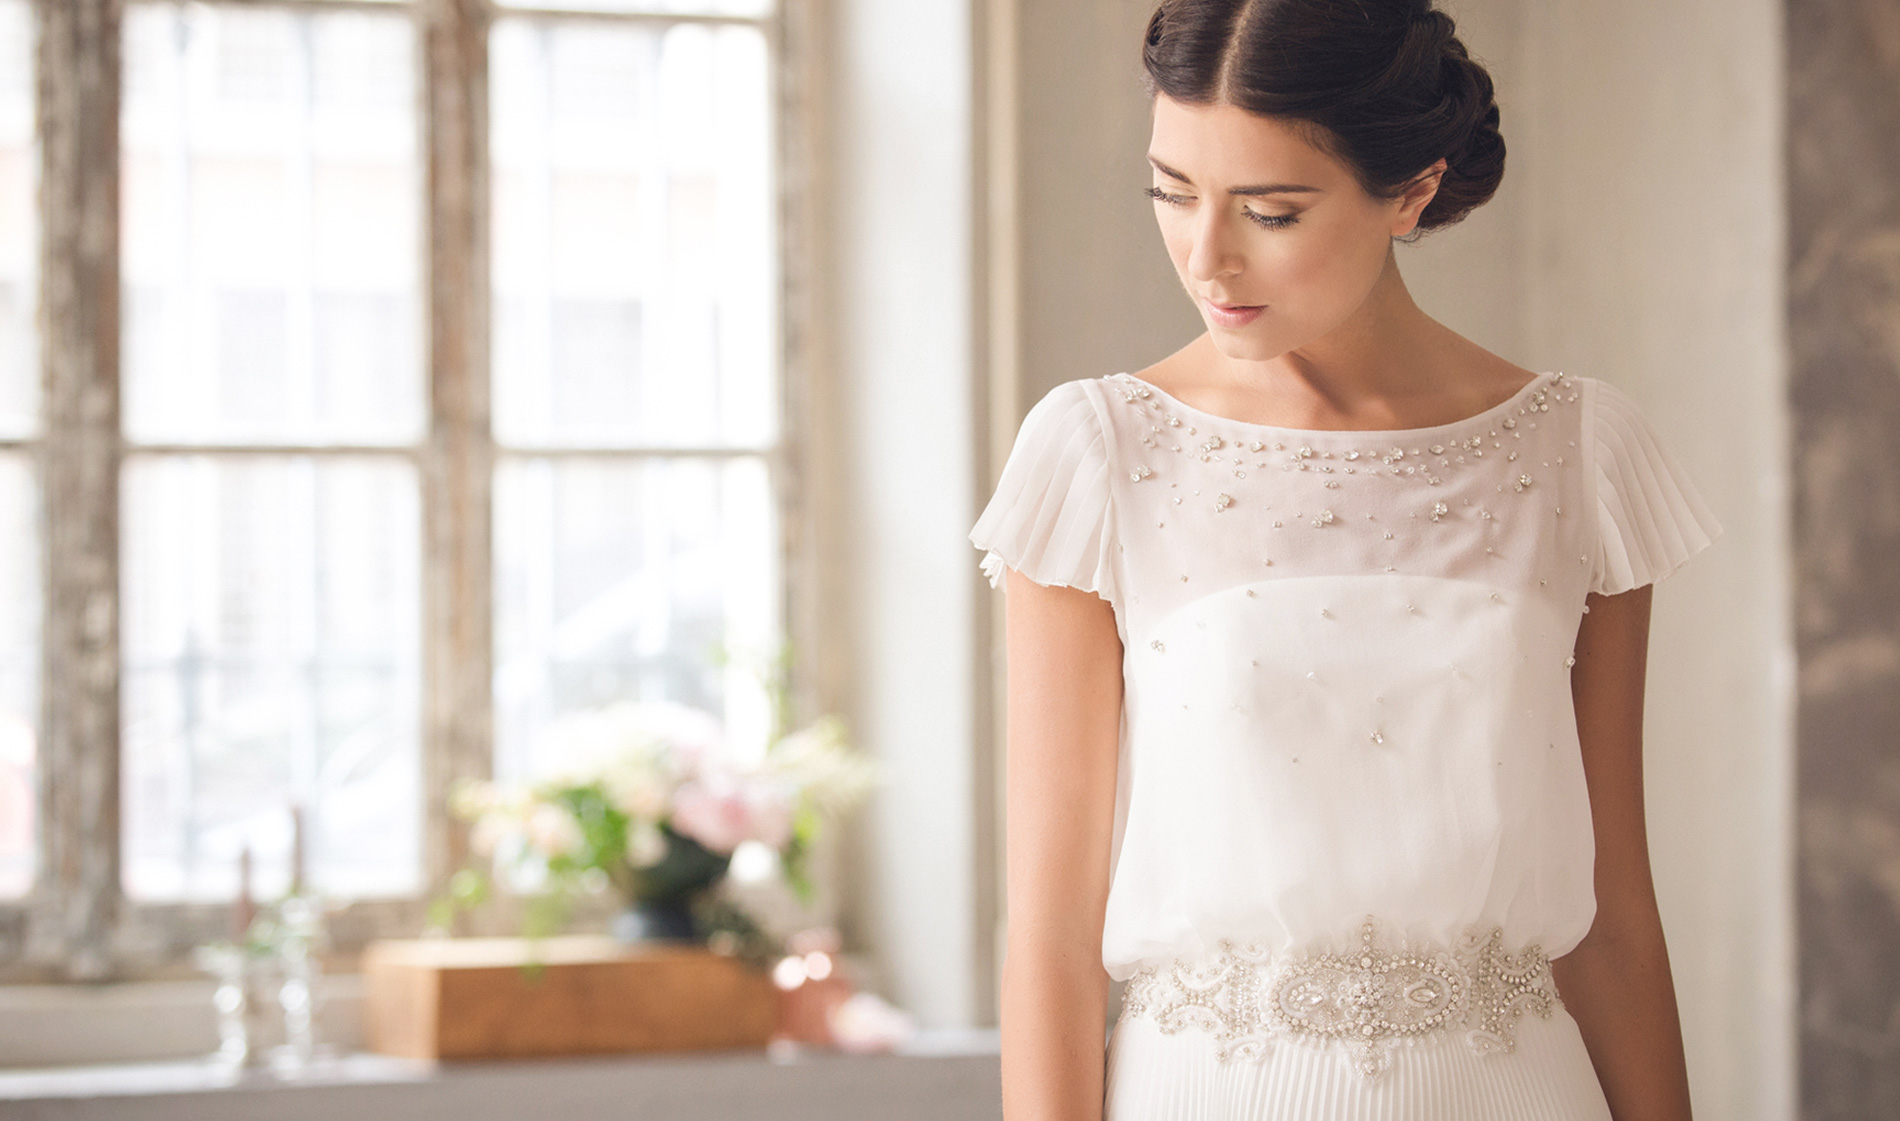 abiti da sposa sera, abiti da sposa eleganti, abiti da sposa per rito civile, abito da sposa couture